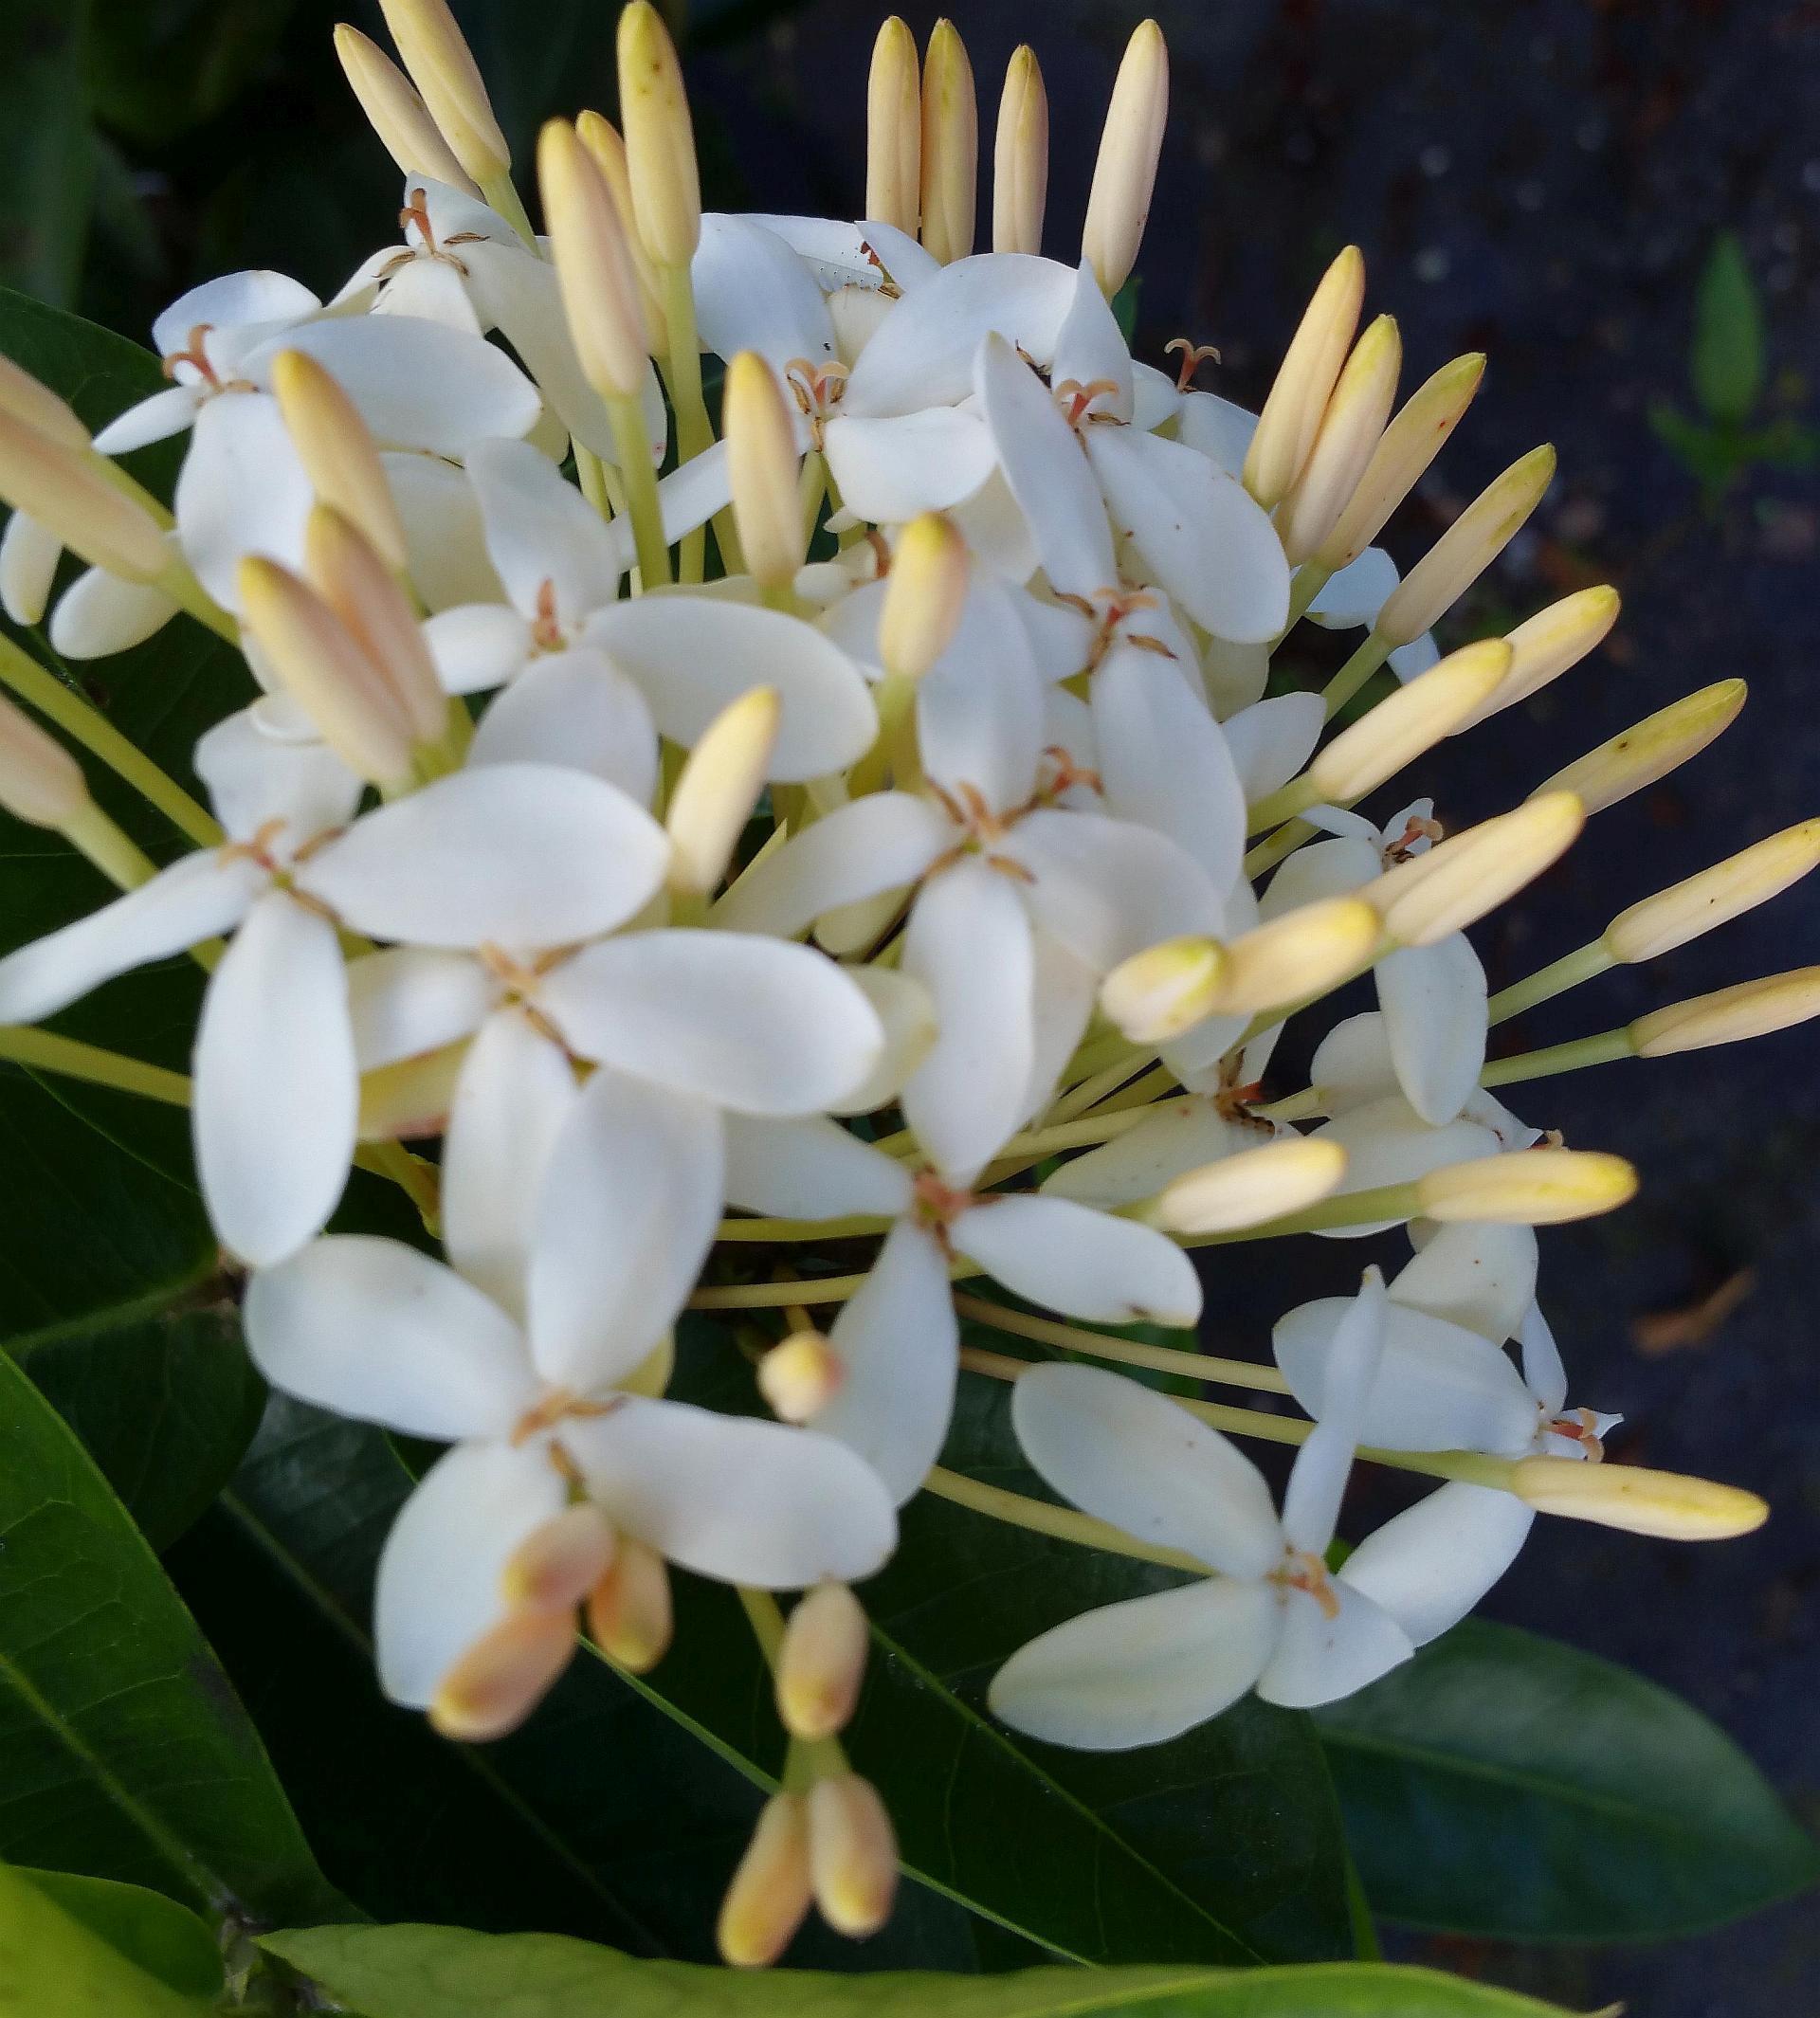 Alibertia Belize White Shooting Star Live Plant Fragrant Flowers